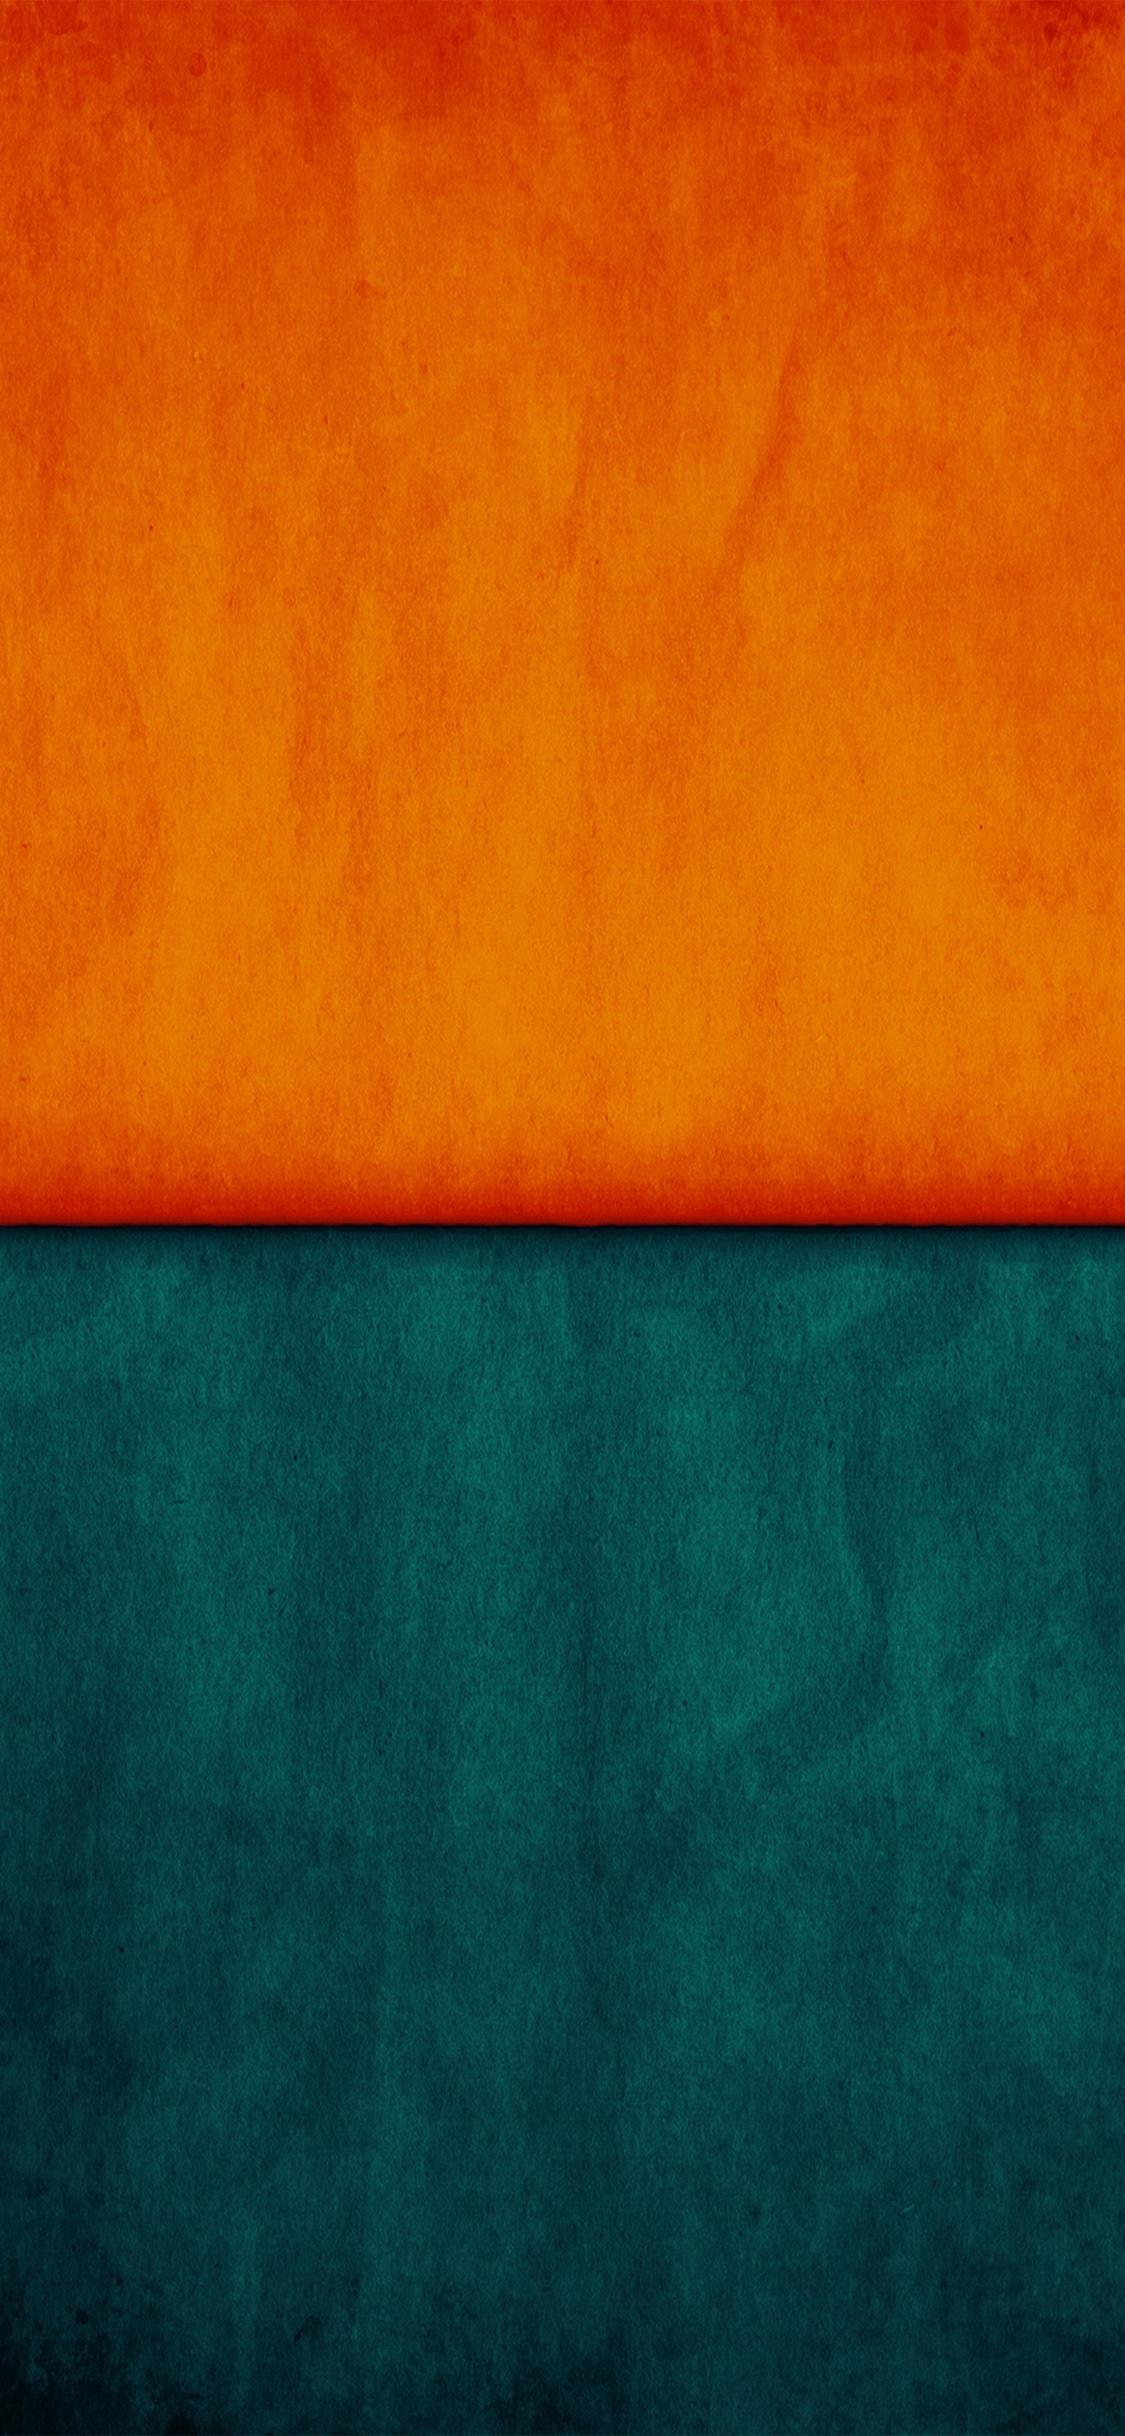 iPhoneXpapers.com-Apple-iPhone-wallpaper-vx27-orange-blue-pattern-background